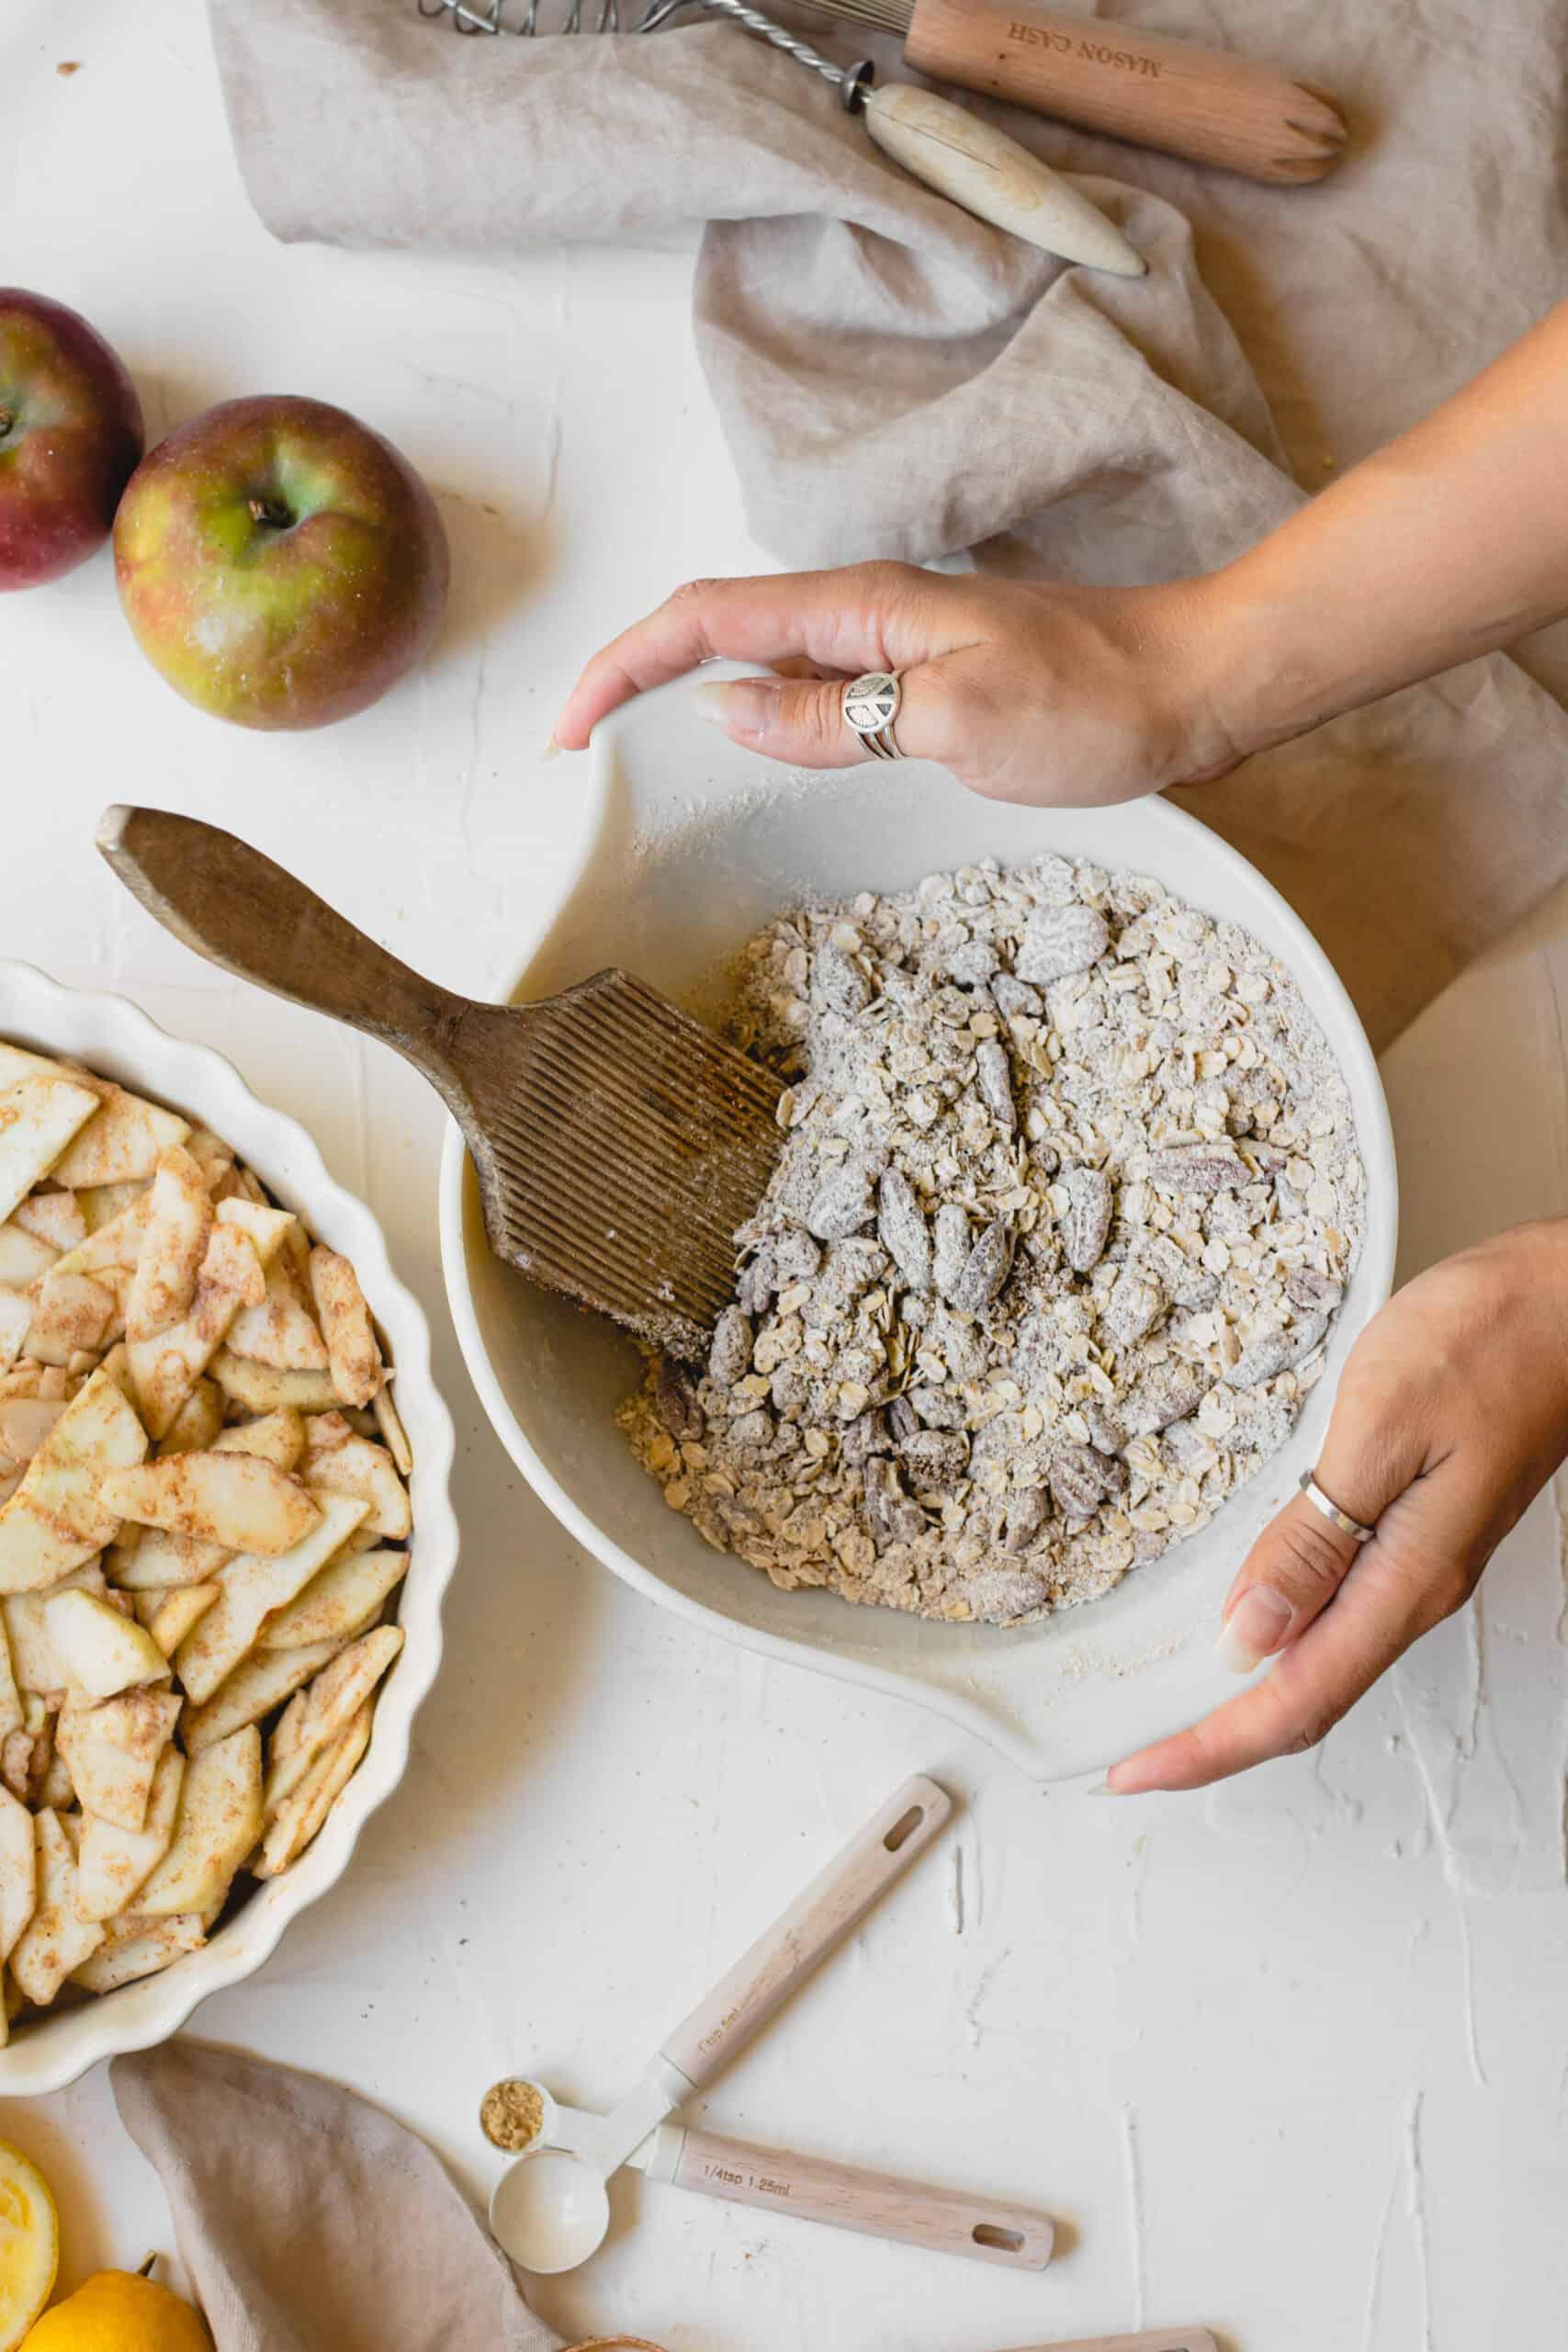 Dry ingredients for Vegan Apple Crumble in white bowl.